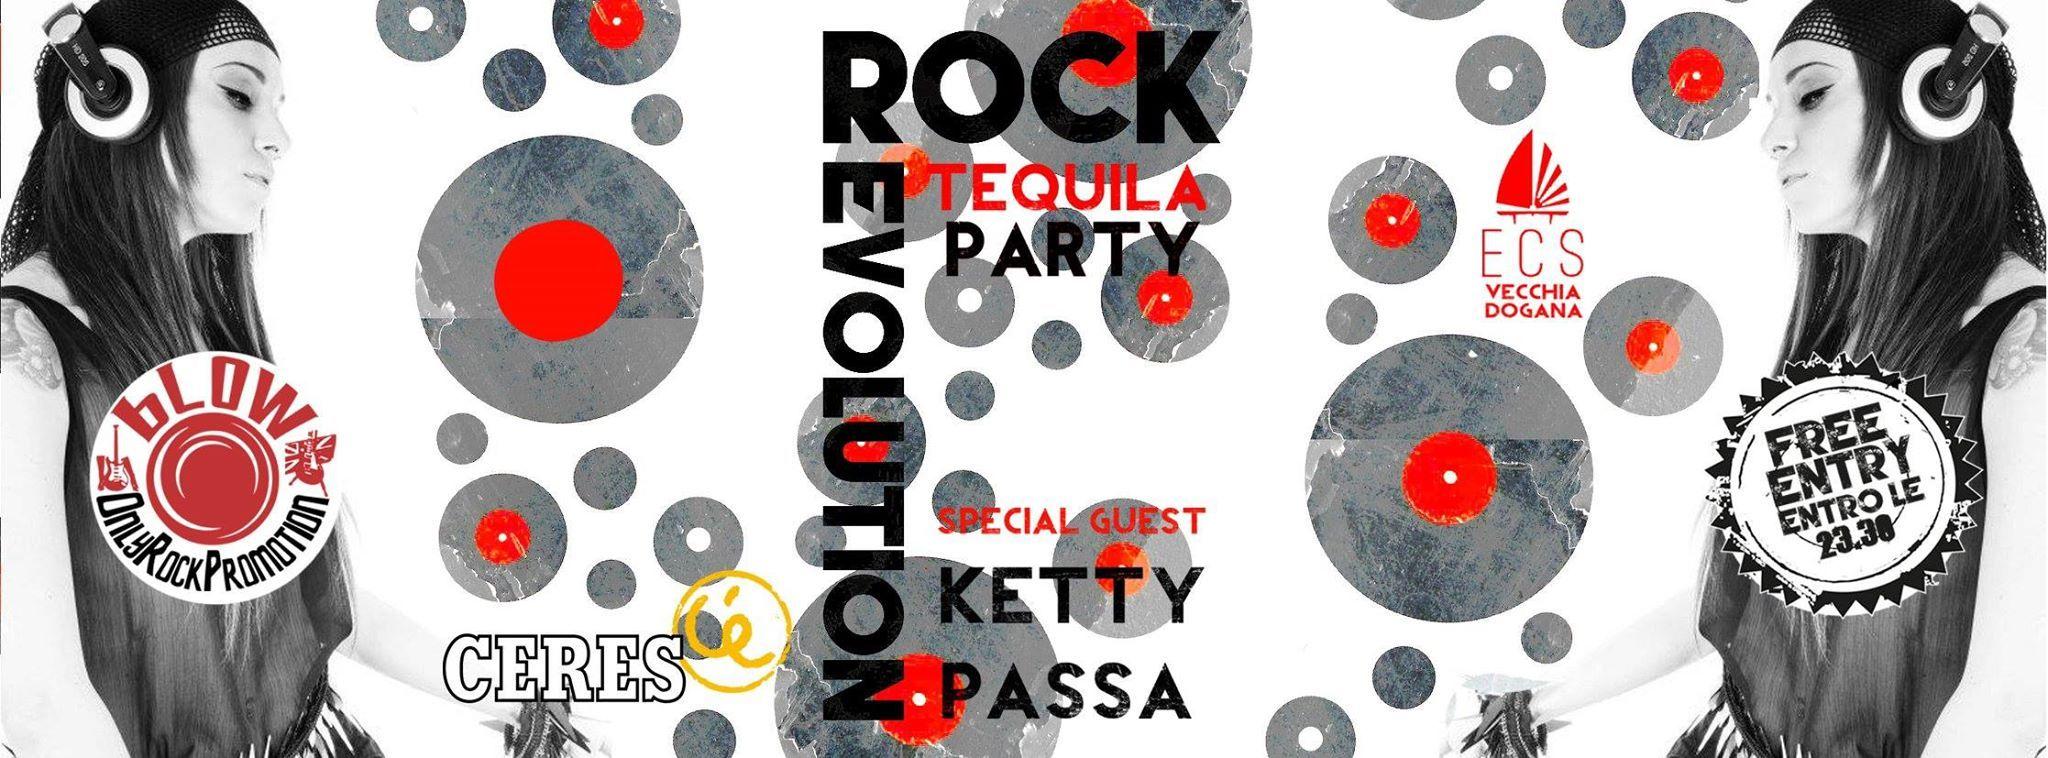 Rock Revolution 2016 - Free Tequila Rock Party + Ketty Passa